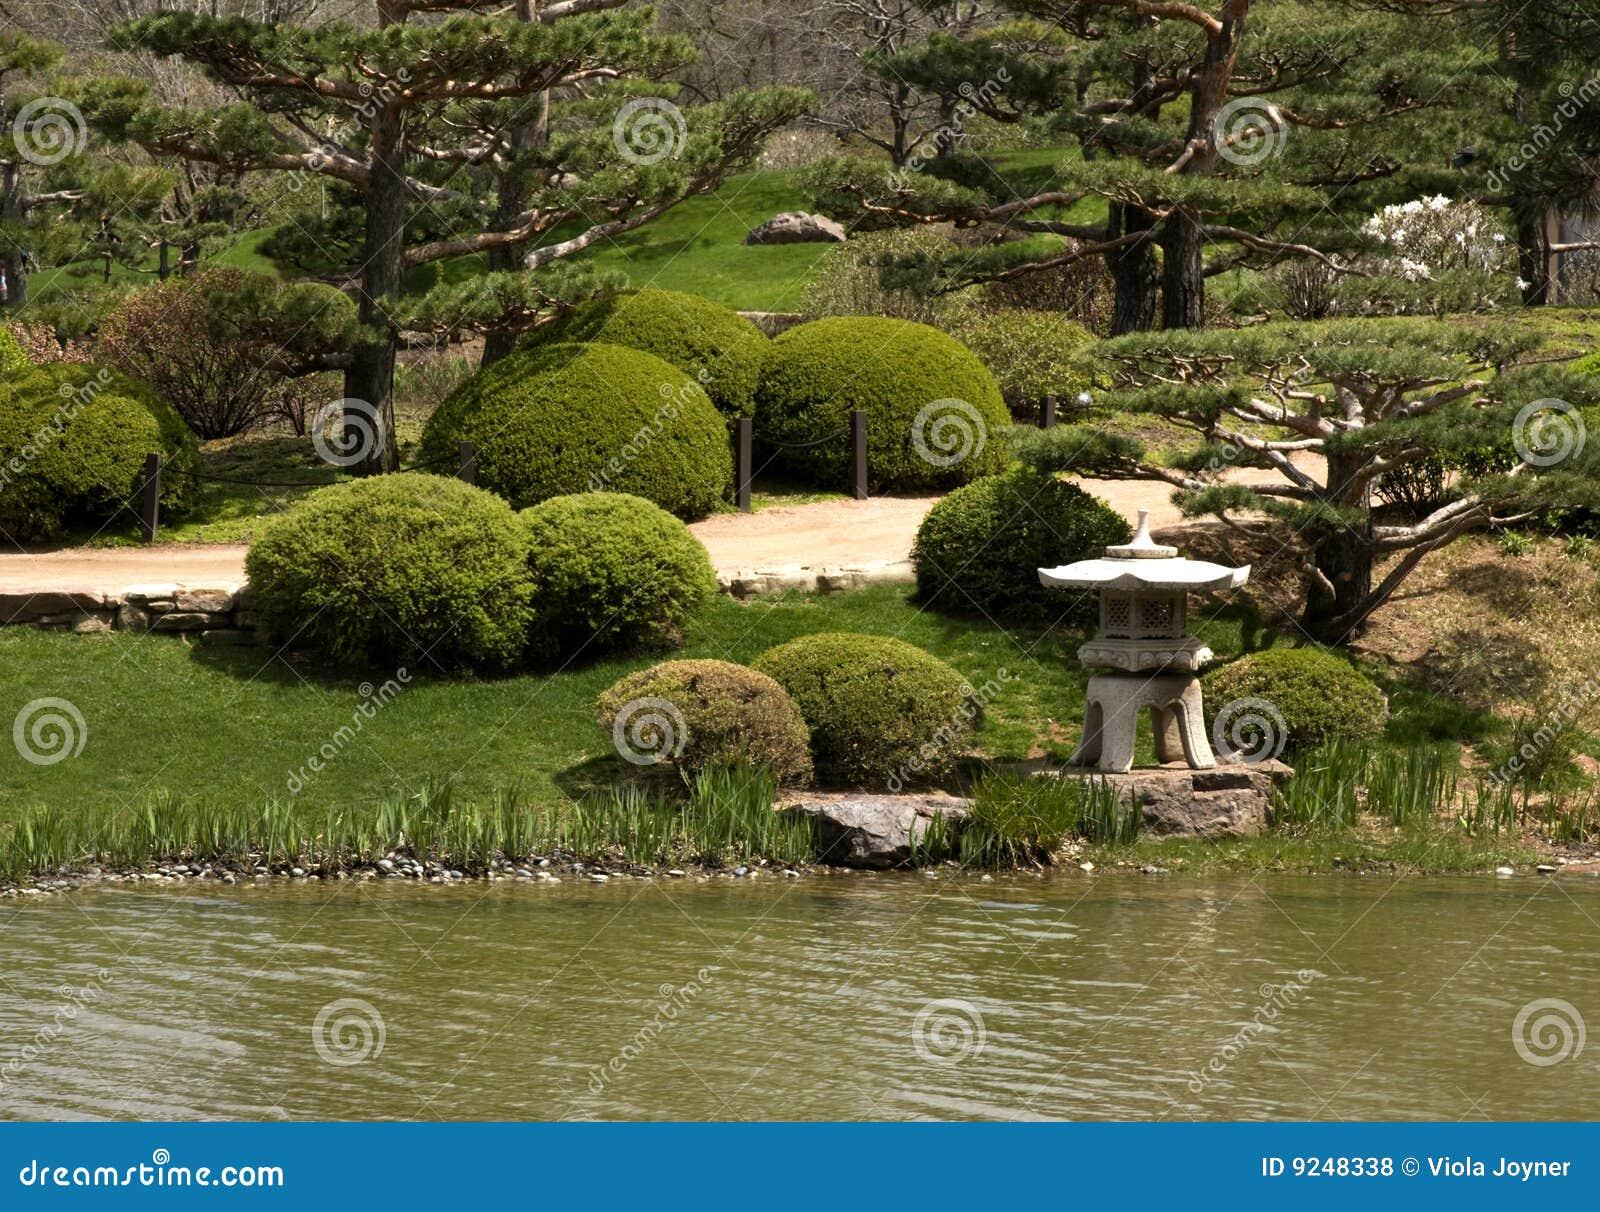 Botanical Garden Royalty Free Stock Photos Image 9248338